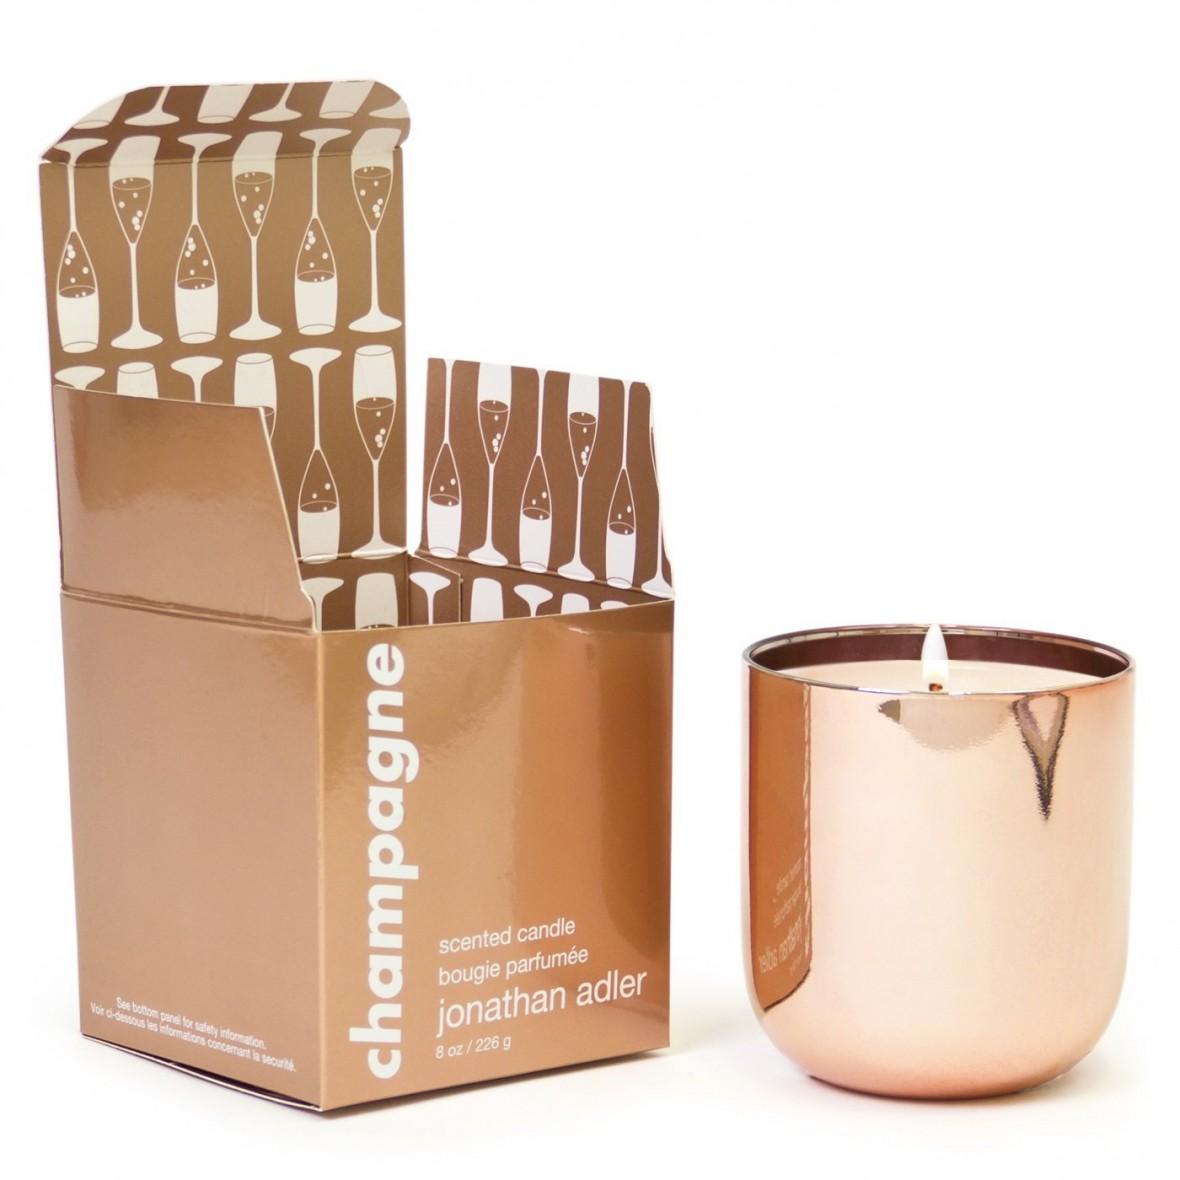 Hostess Gift Idea - Jonathan Adler Champagne Candle